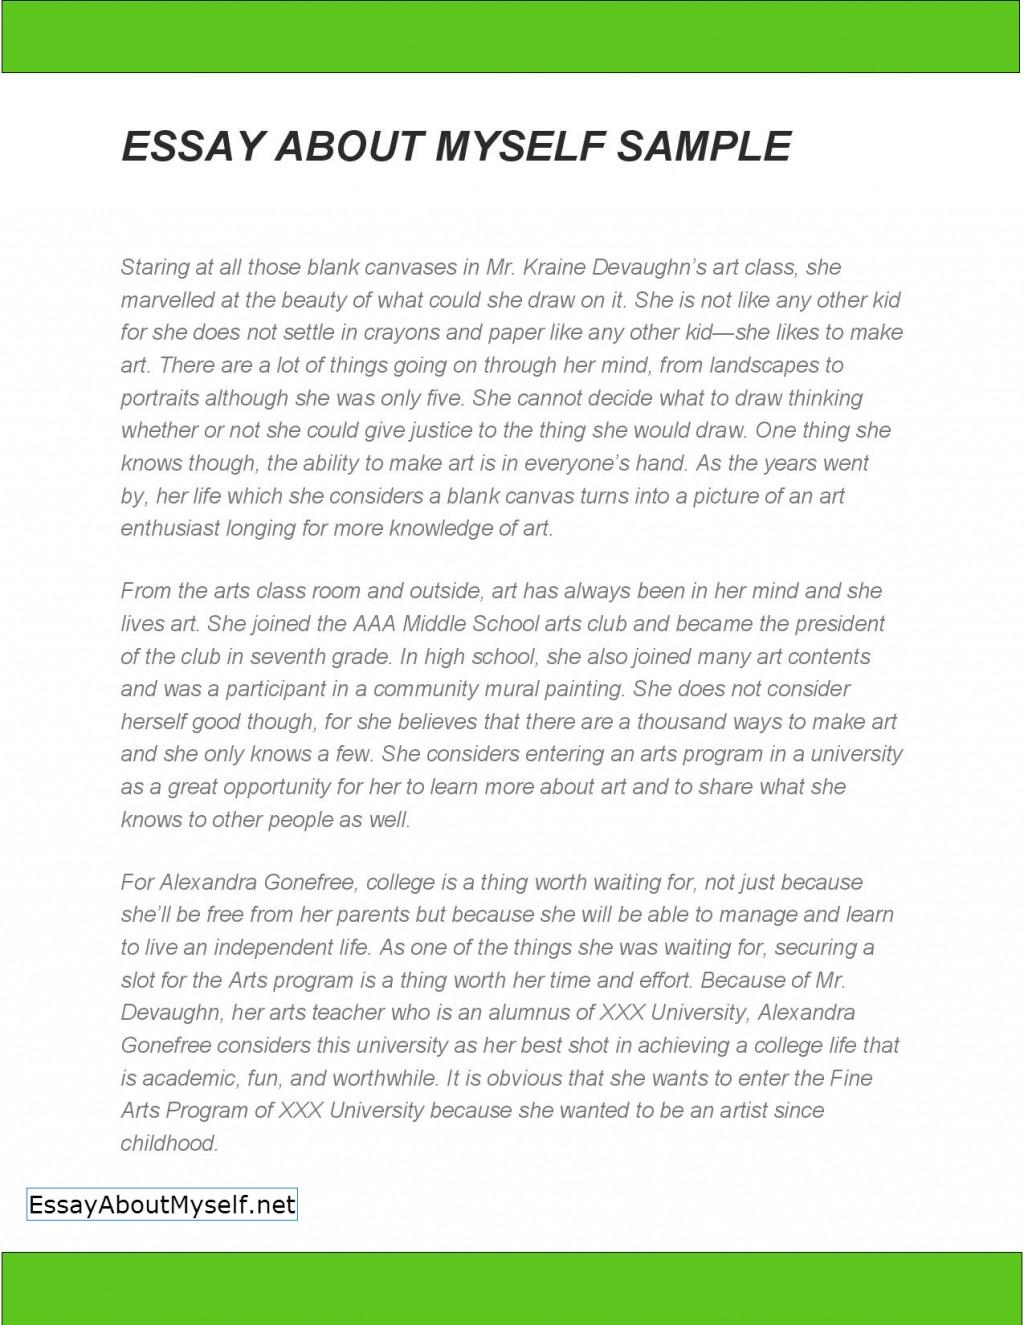 007 Essay About Myself Sample Example Self Wonderful Introduction Pdf For Job University Large